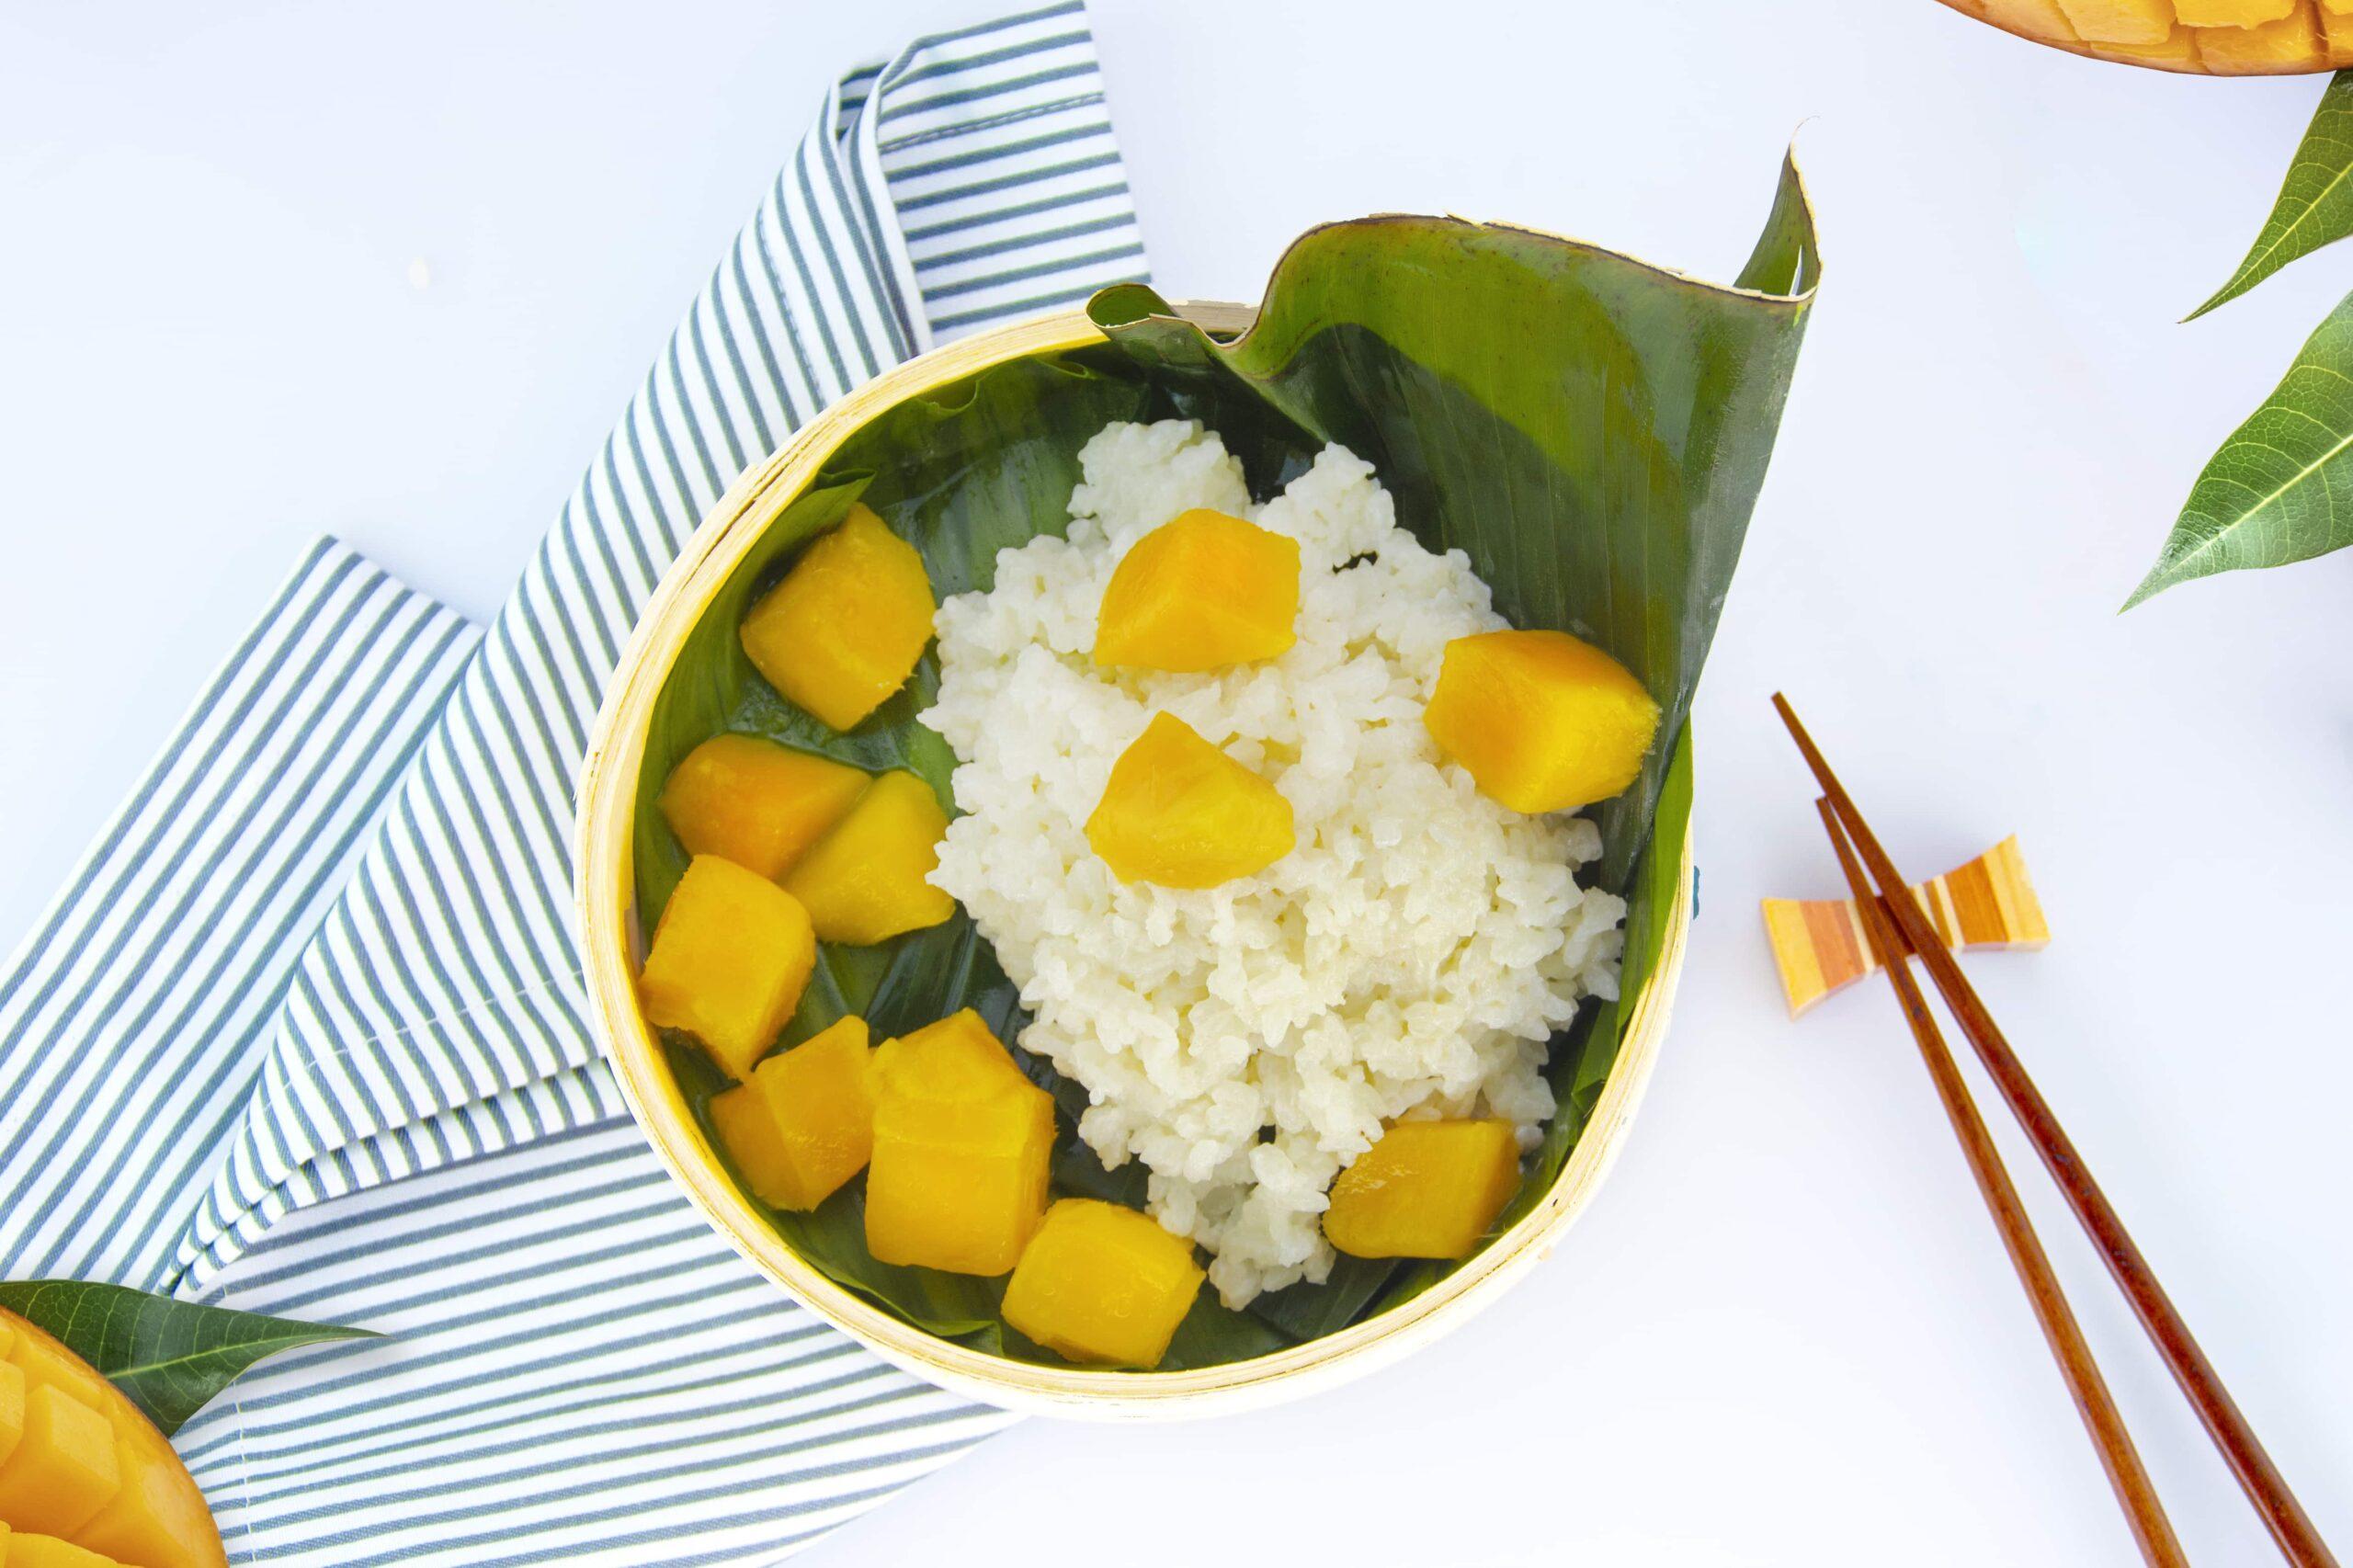 Рецепт риса с кокосовым молоком и манго